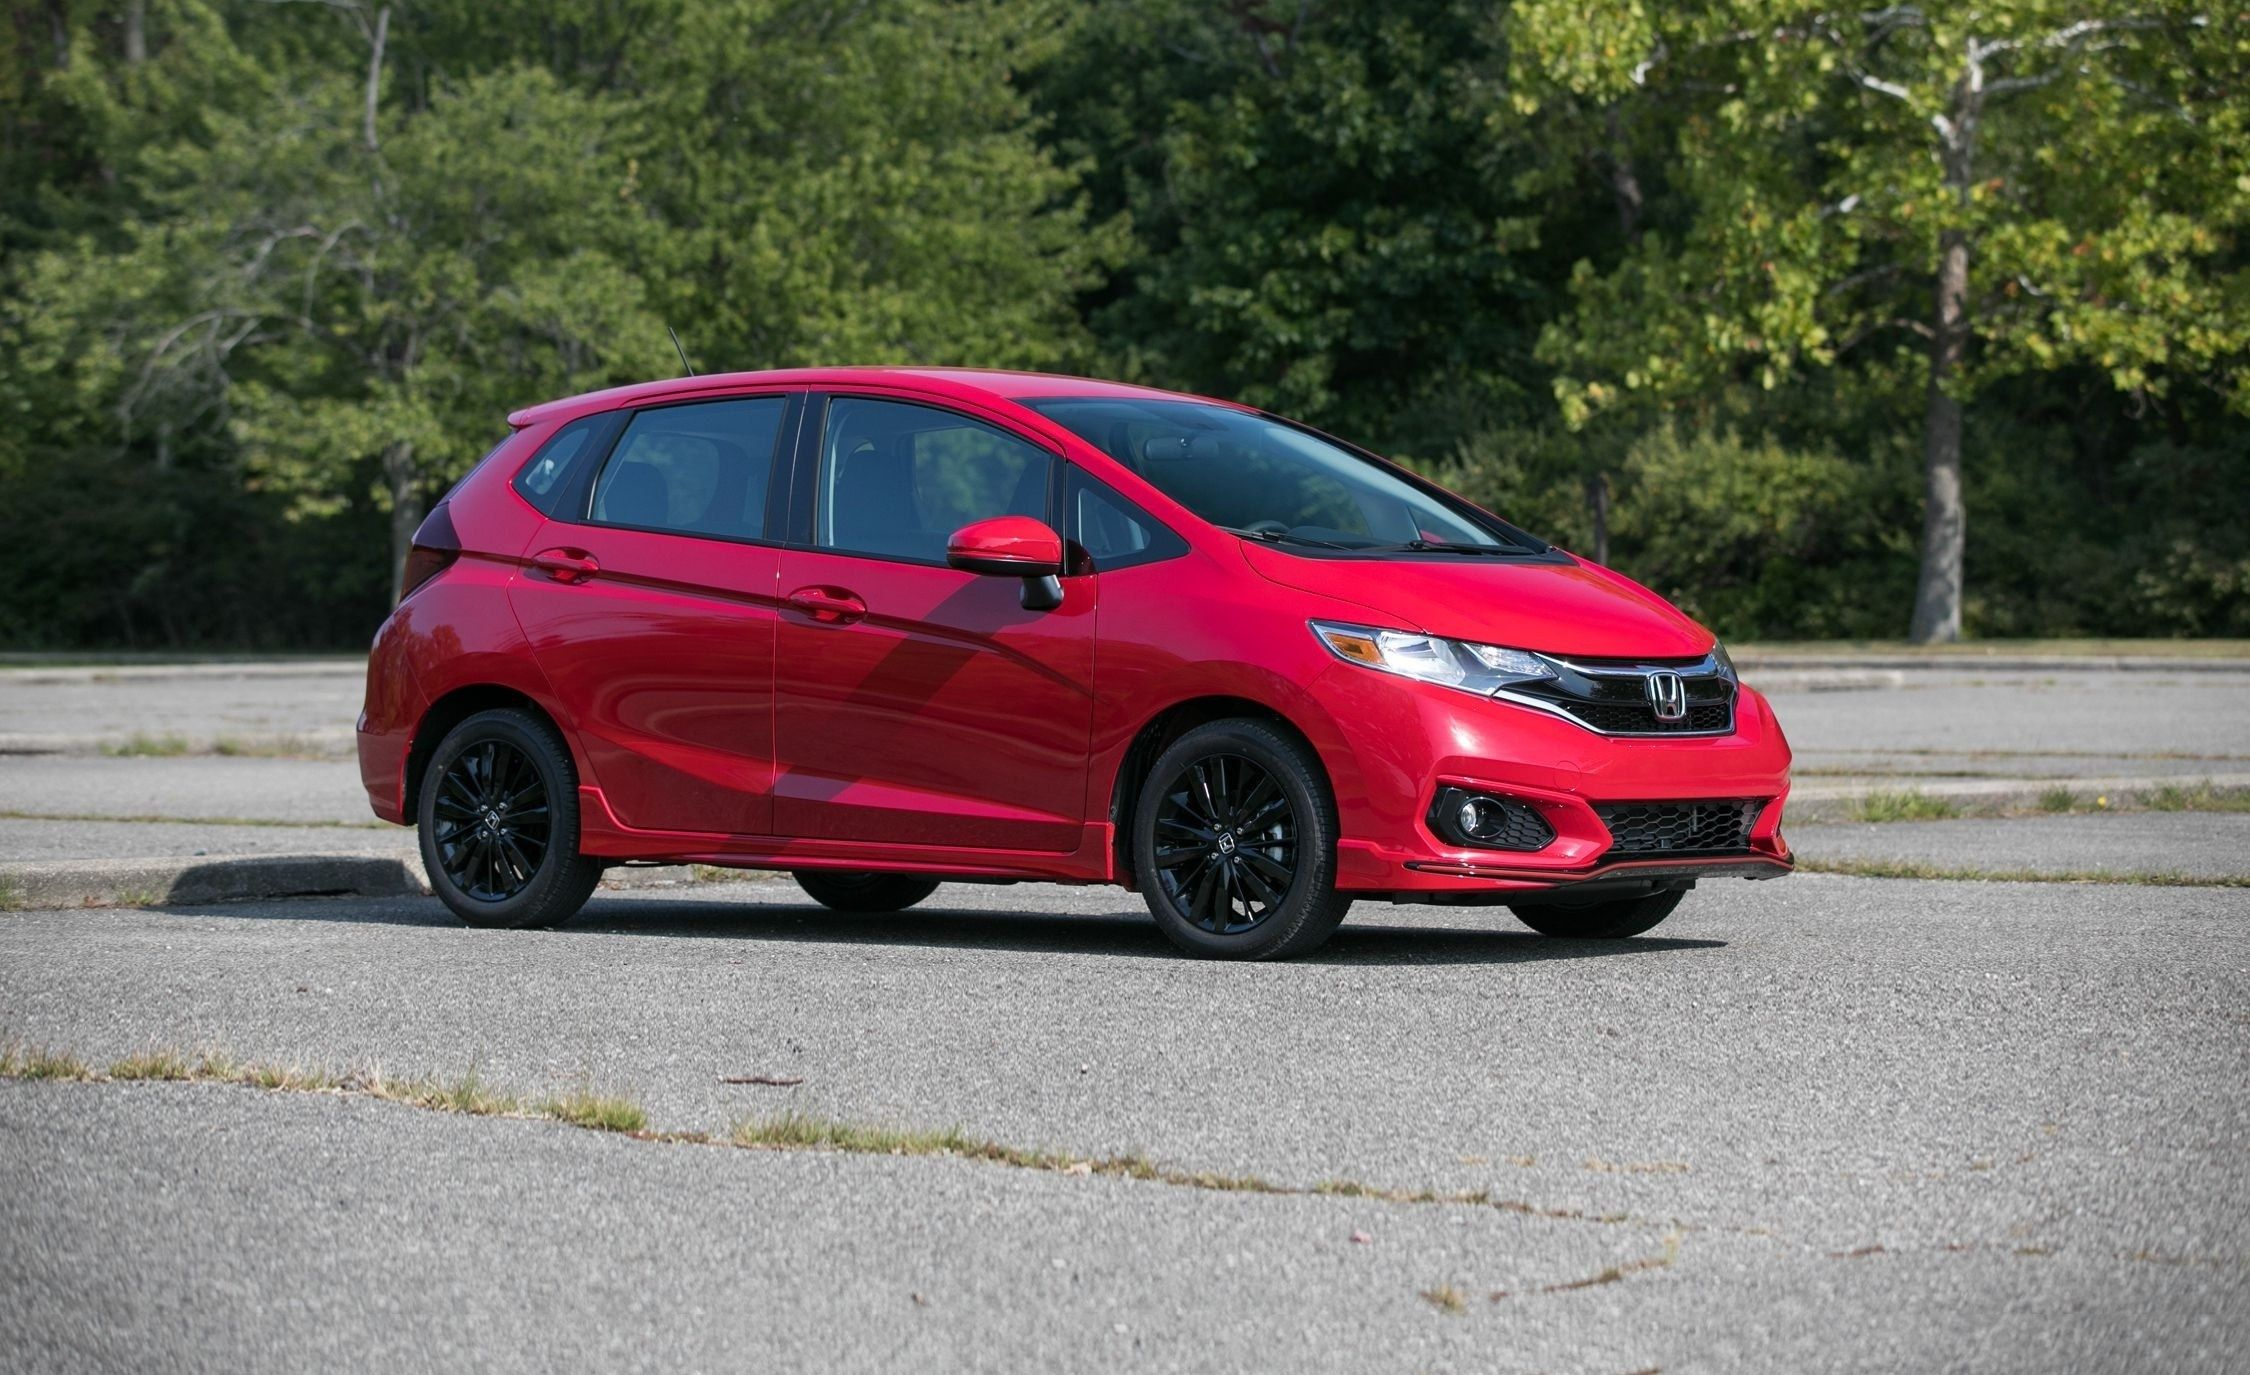 Images Of Honda Fit Lx 2020 Honda Fit Lx Honda Fit Cheap Sports Cars